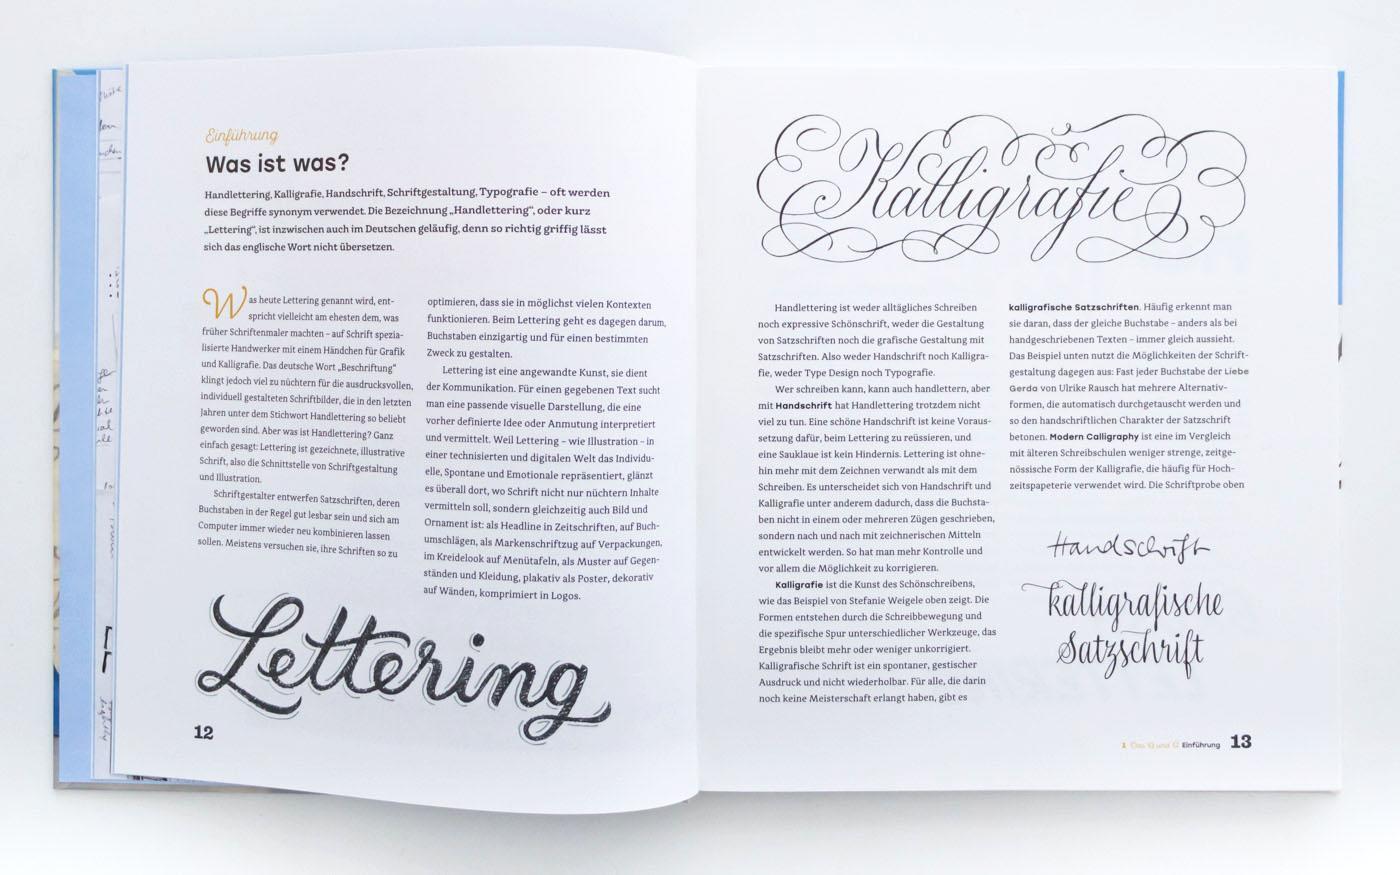 Campe_Handbuch-Handlettering_978-3-258-60165-6_-9.jpg